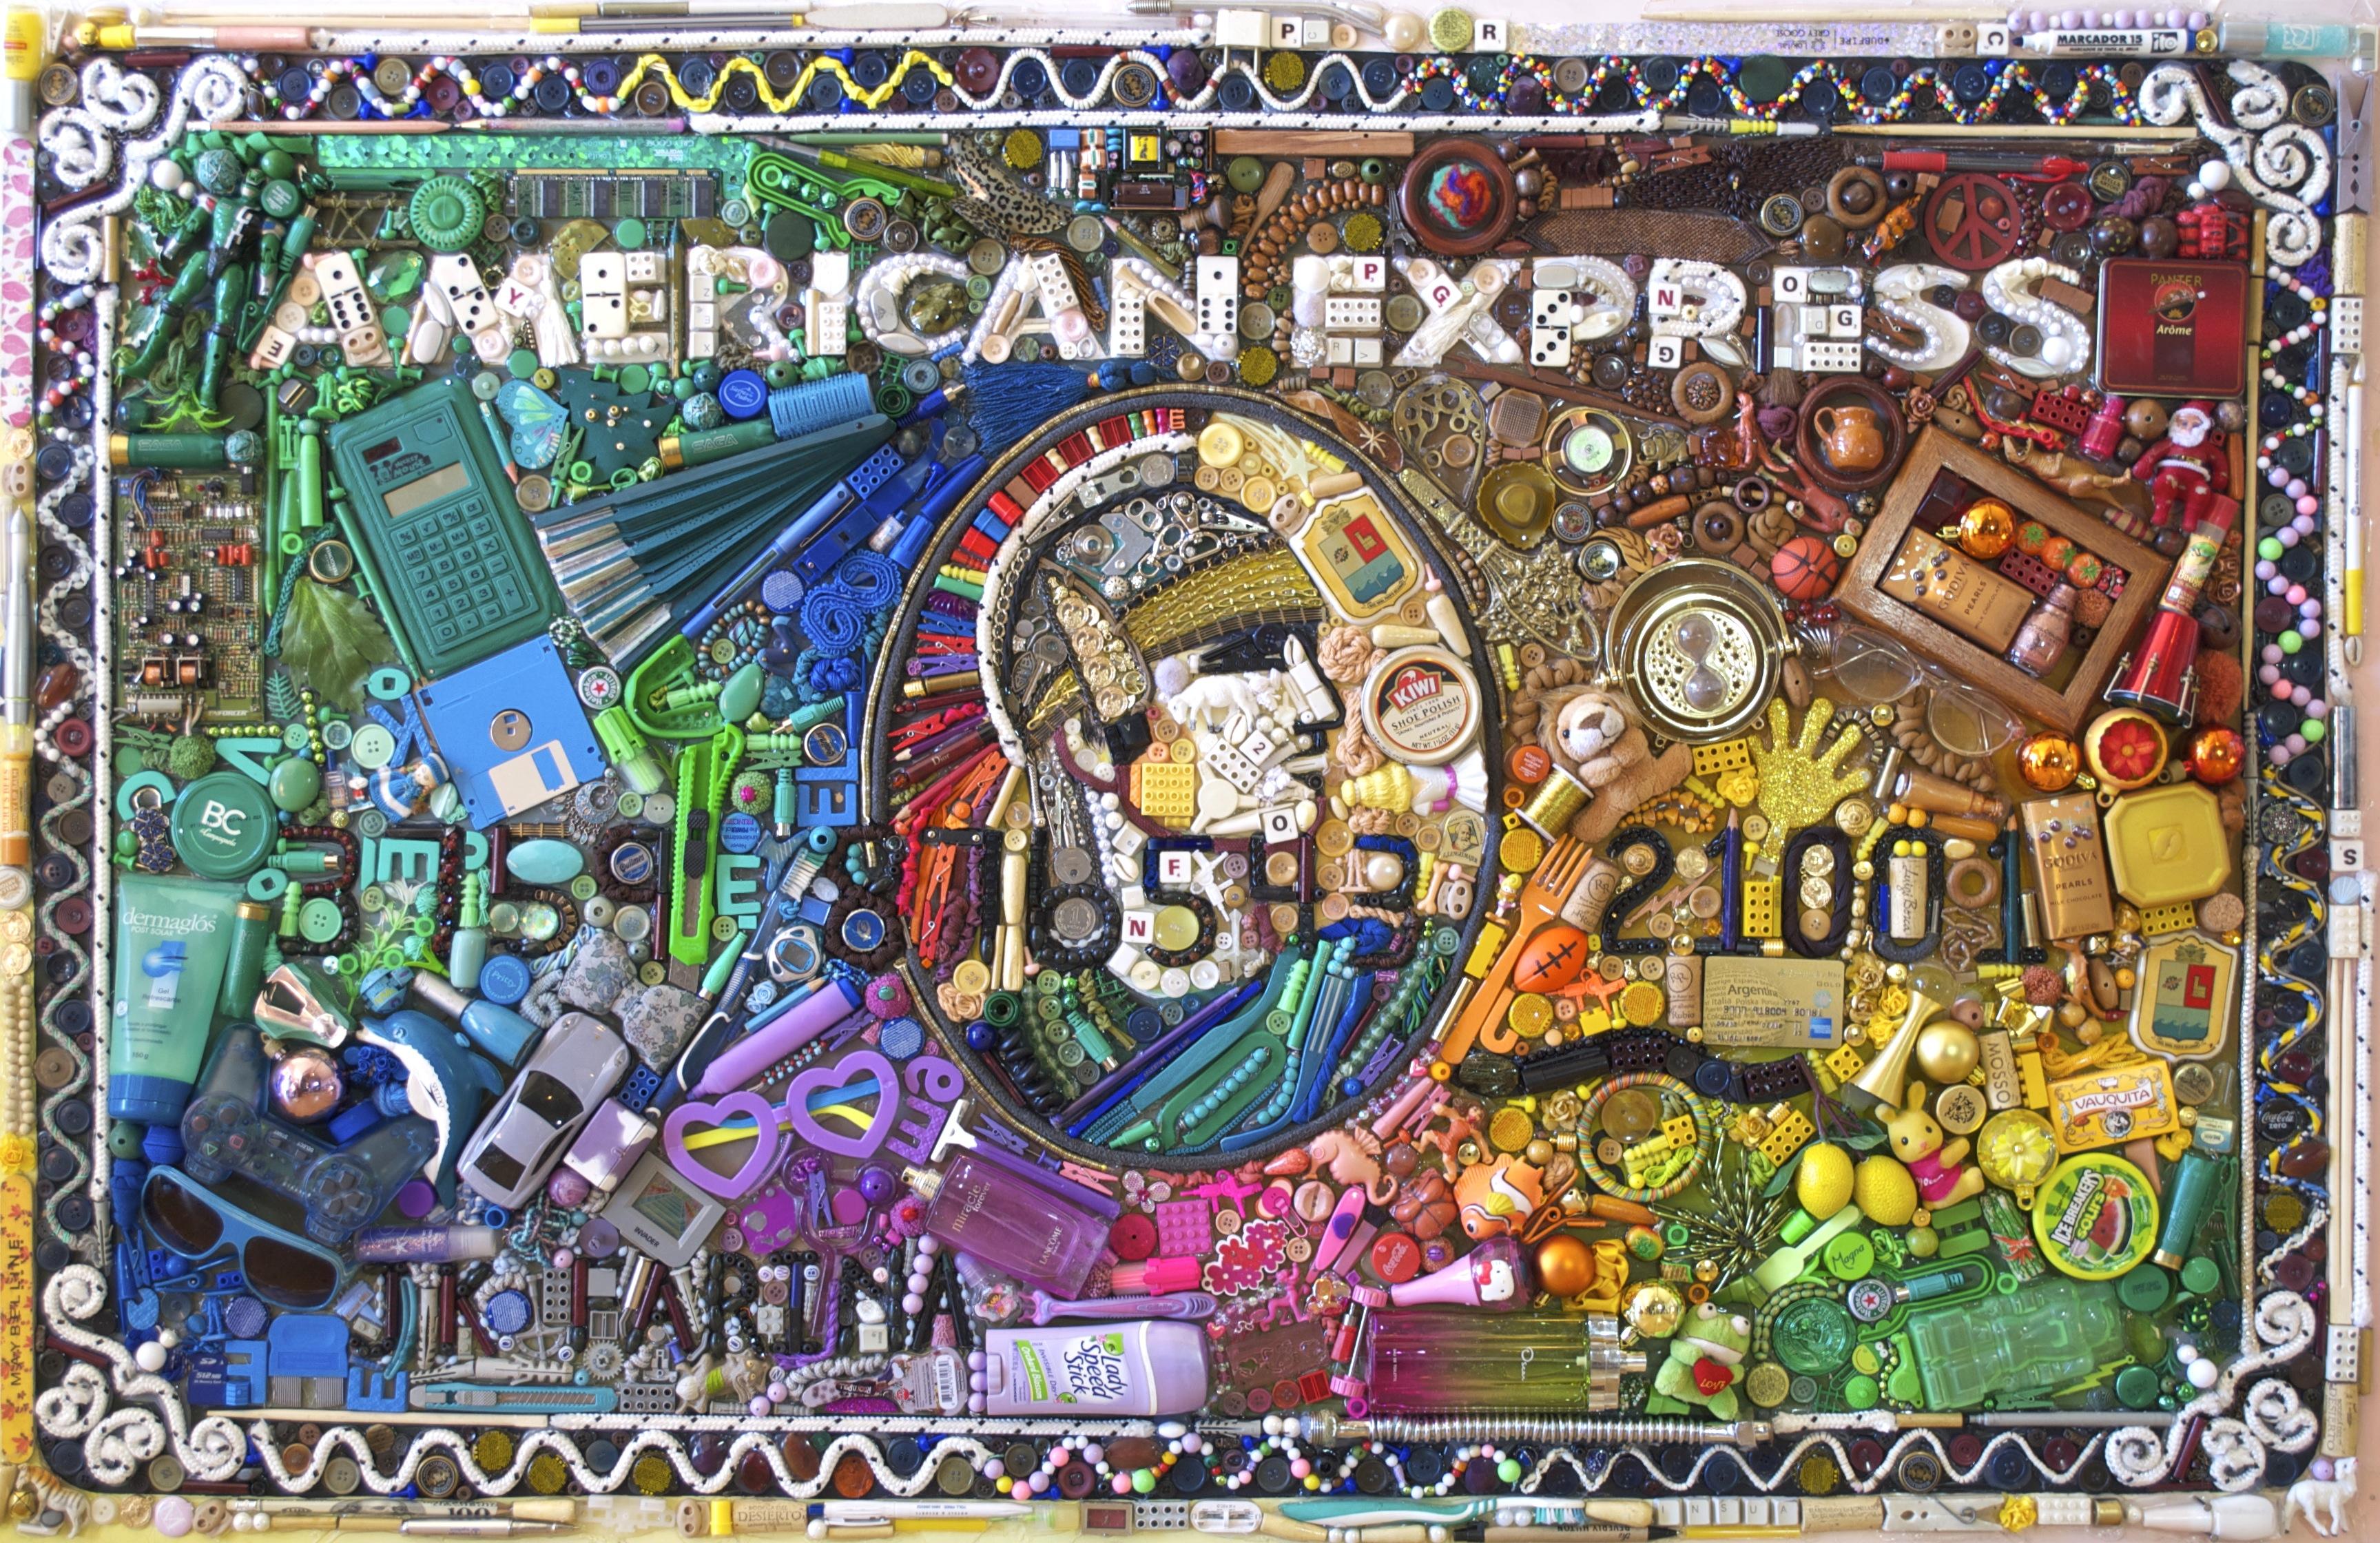 1280x645The_American_Express_-_Elisa_Insua